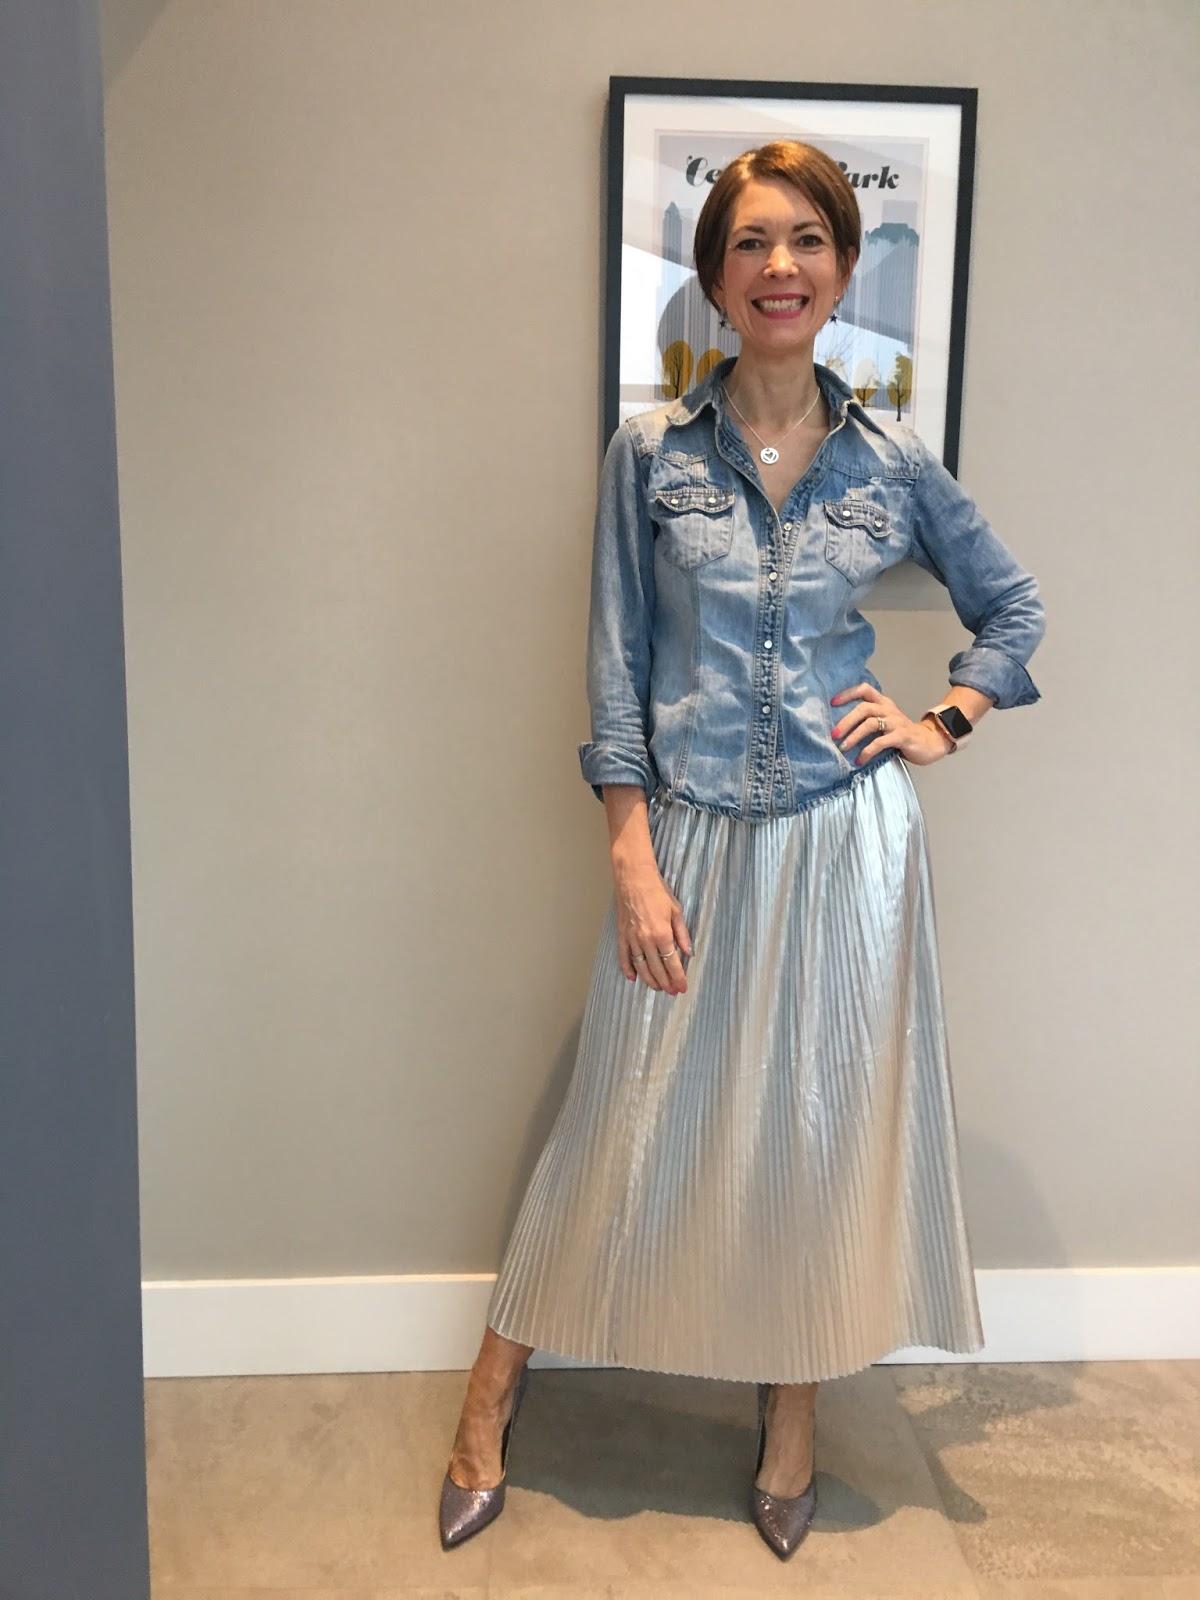 Remarkable, rather Girl bent over skirt